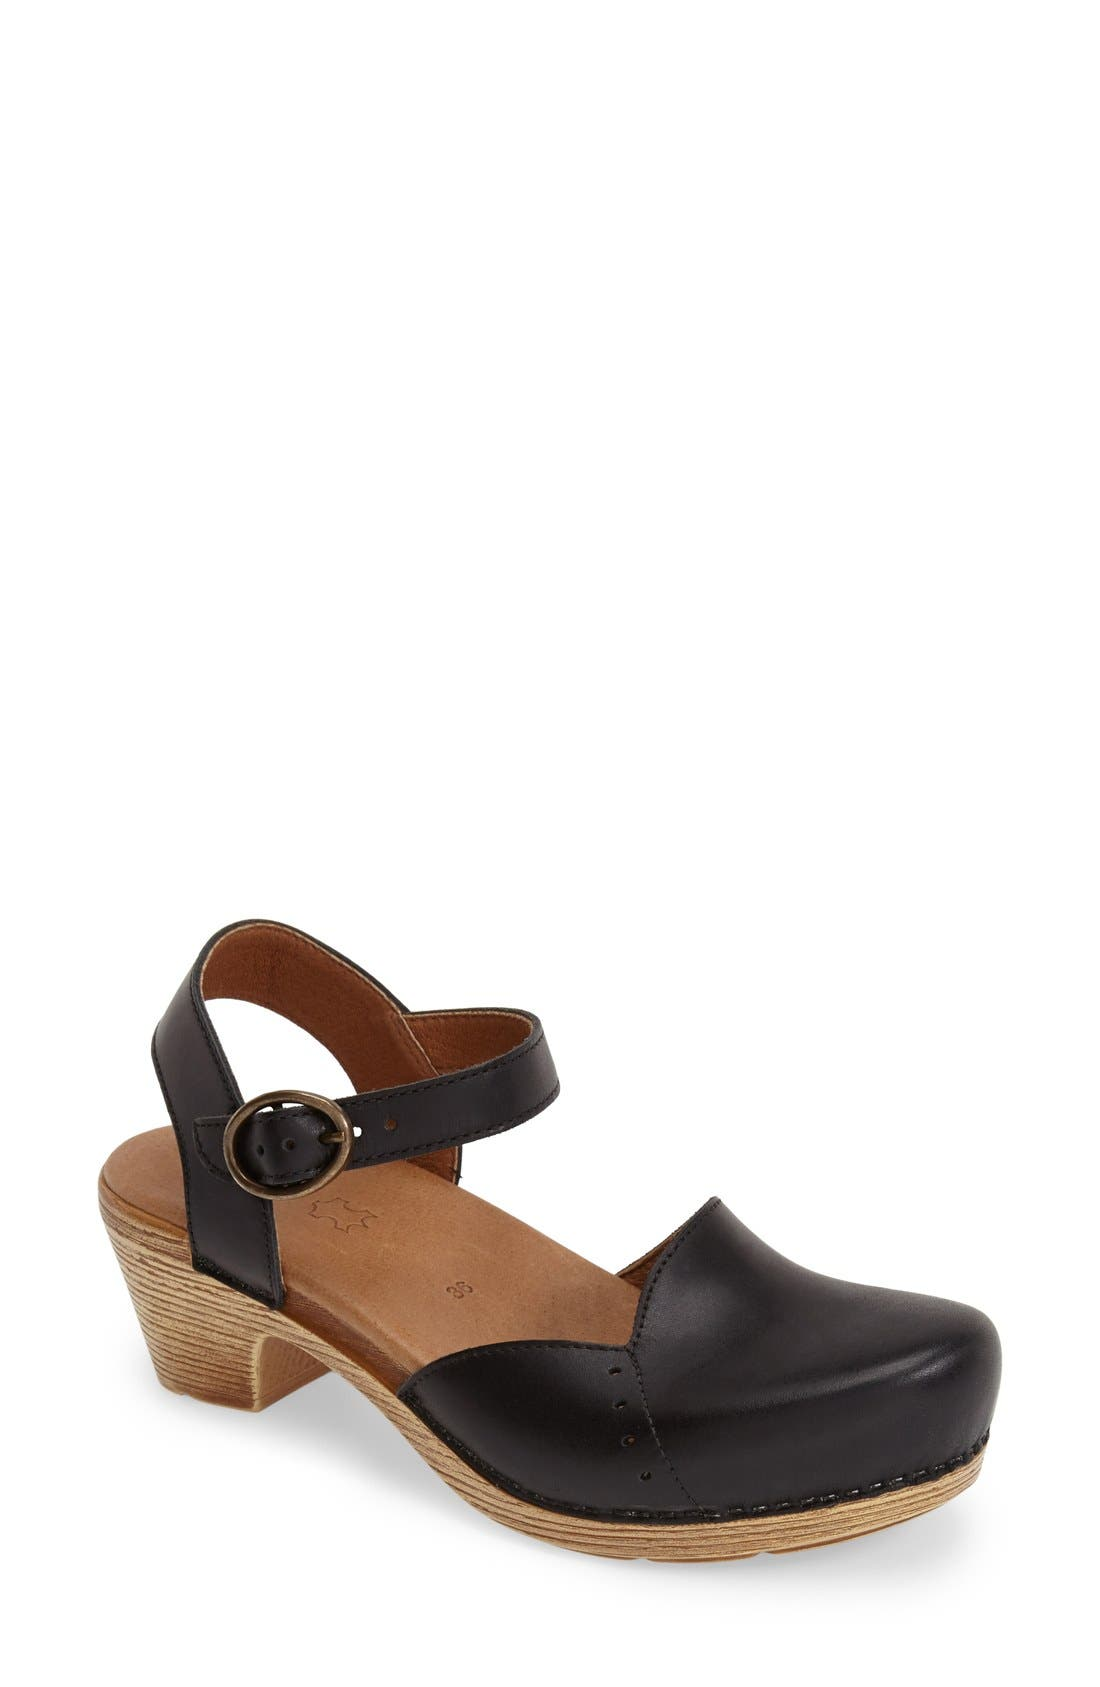 Main Image - Dansko 'Maisie' Ankle Strap Leather Pump (Women)